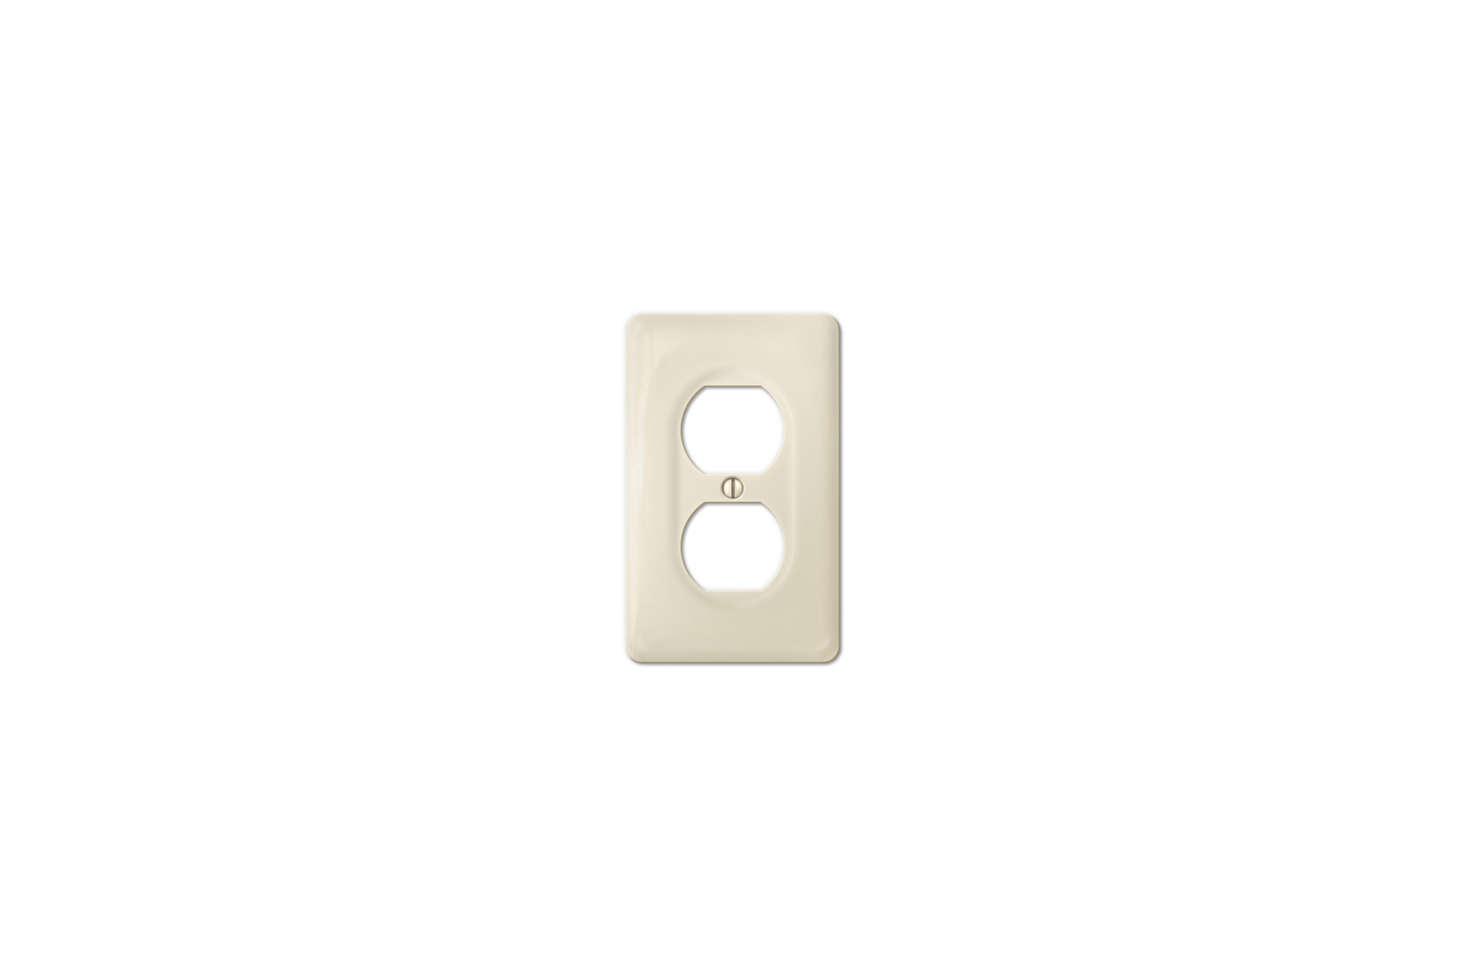 The Amerelle (30DBT) Allena Biscuit Ceramic Duplex Wallplate is $6.67 at Home Depot.